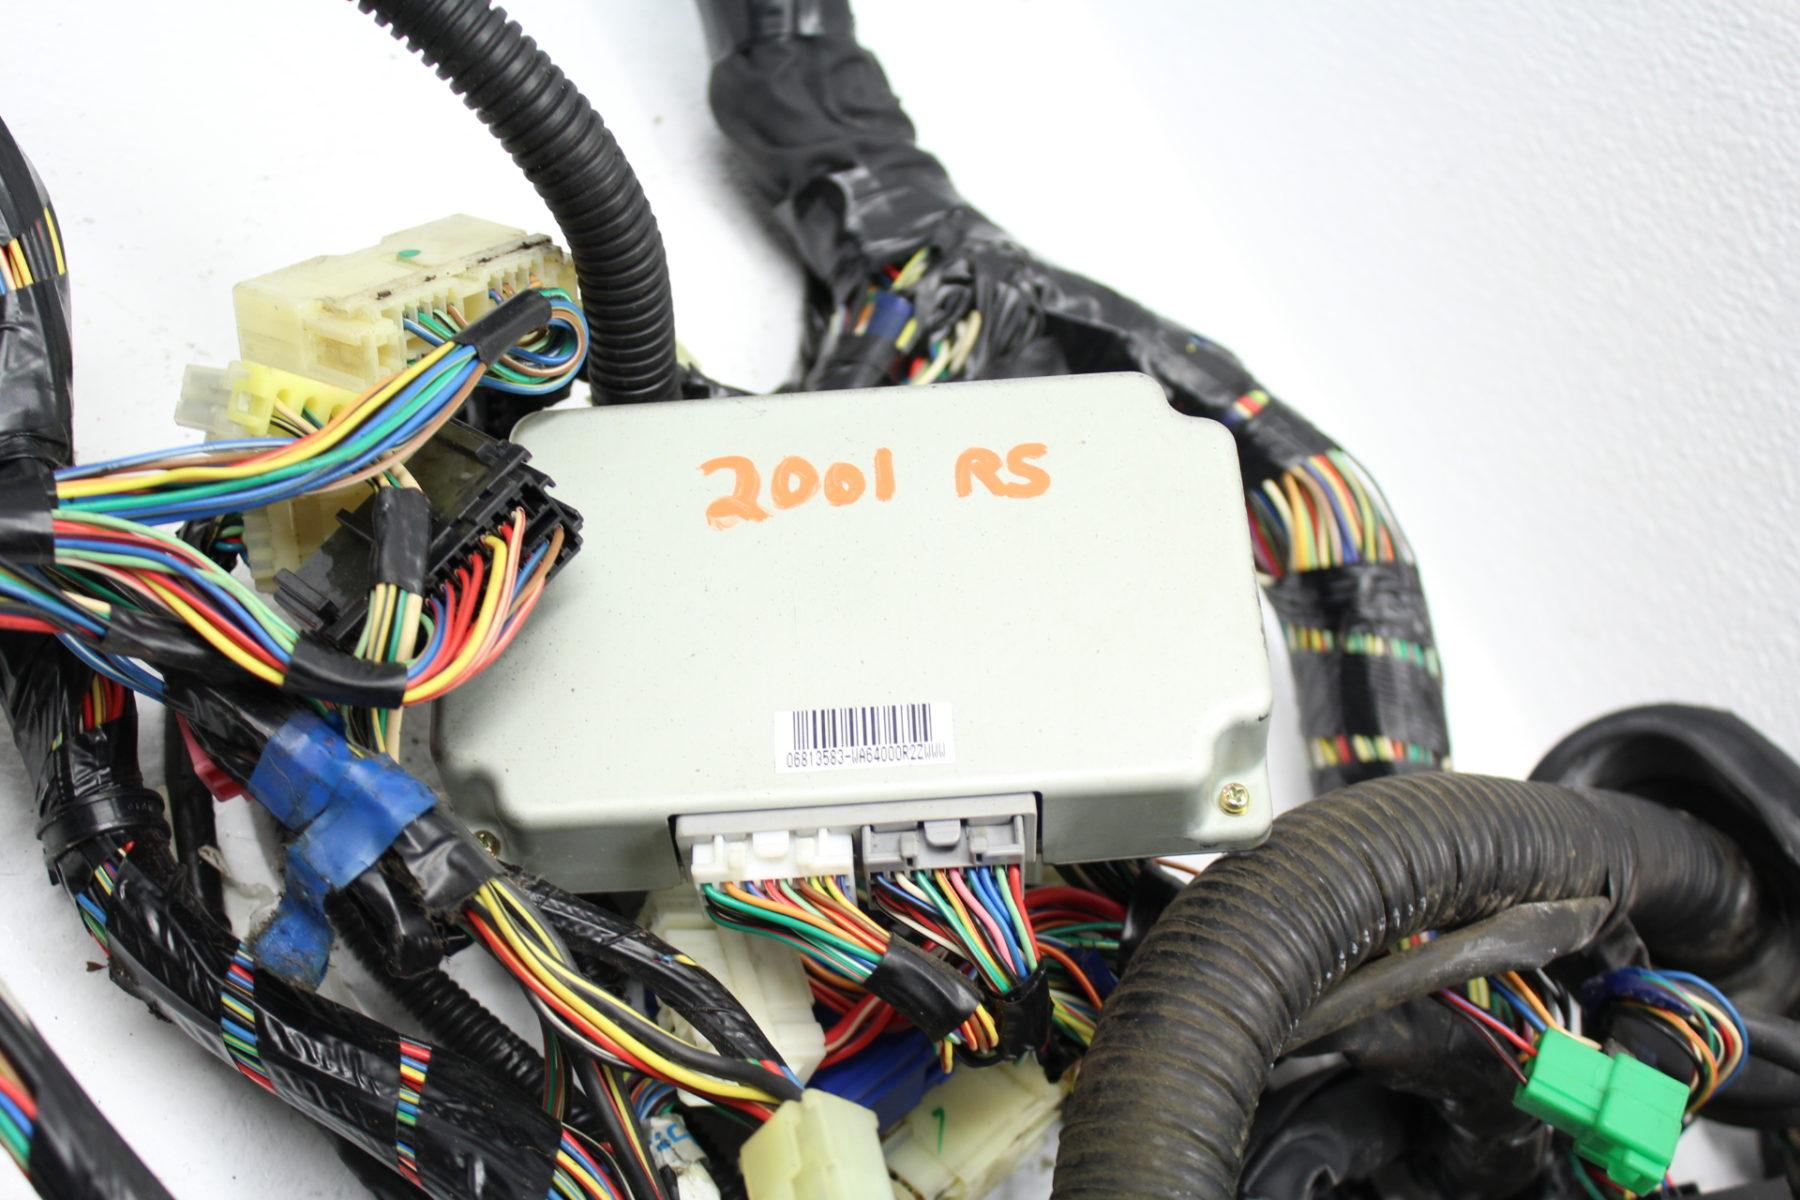 1998-2001 SUBARU IMPREZA 2 5 RS GC8 USDM A/T MAIN BULKHEAD WIRING HARNESS  DASH